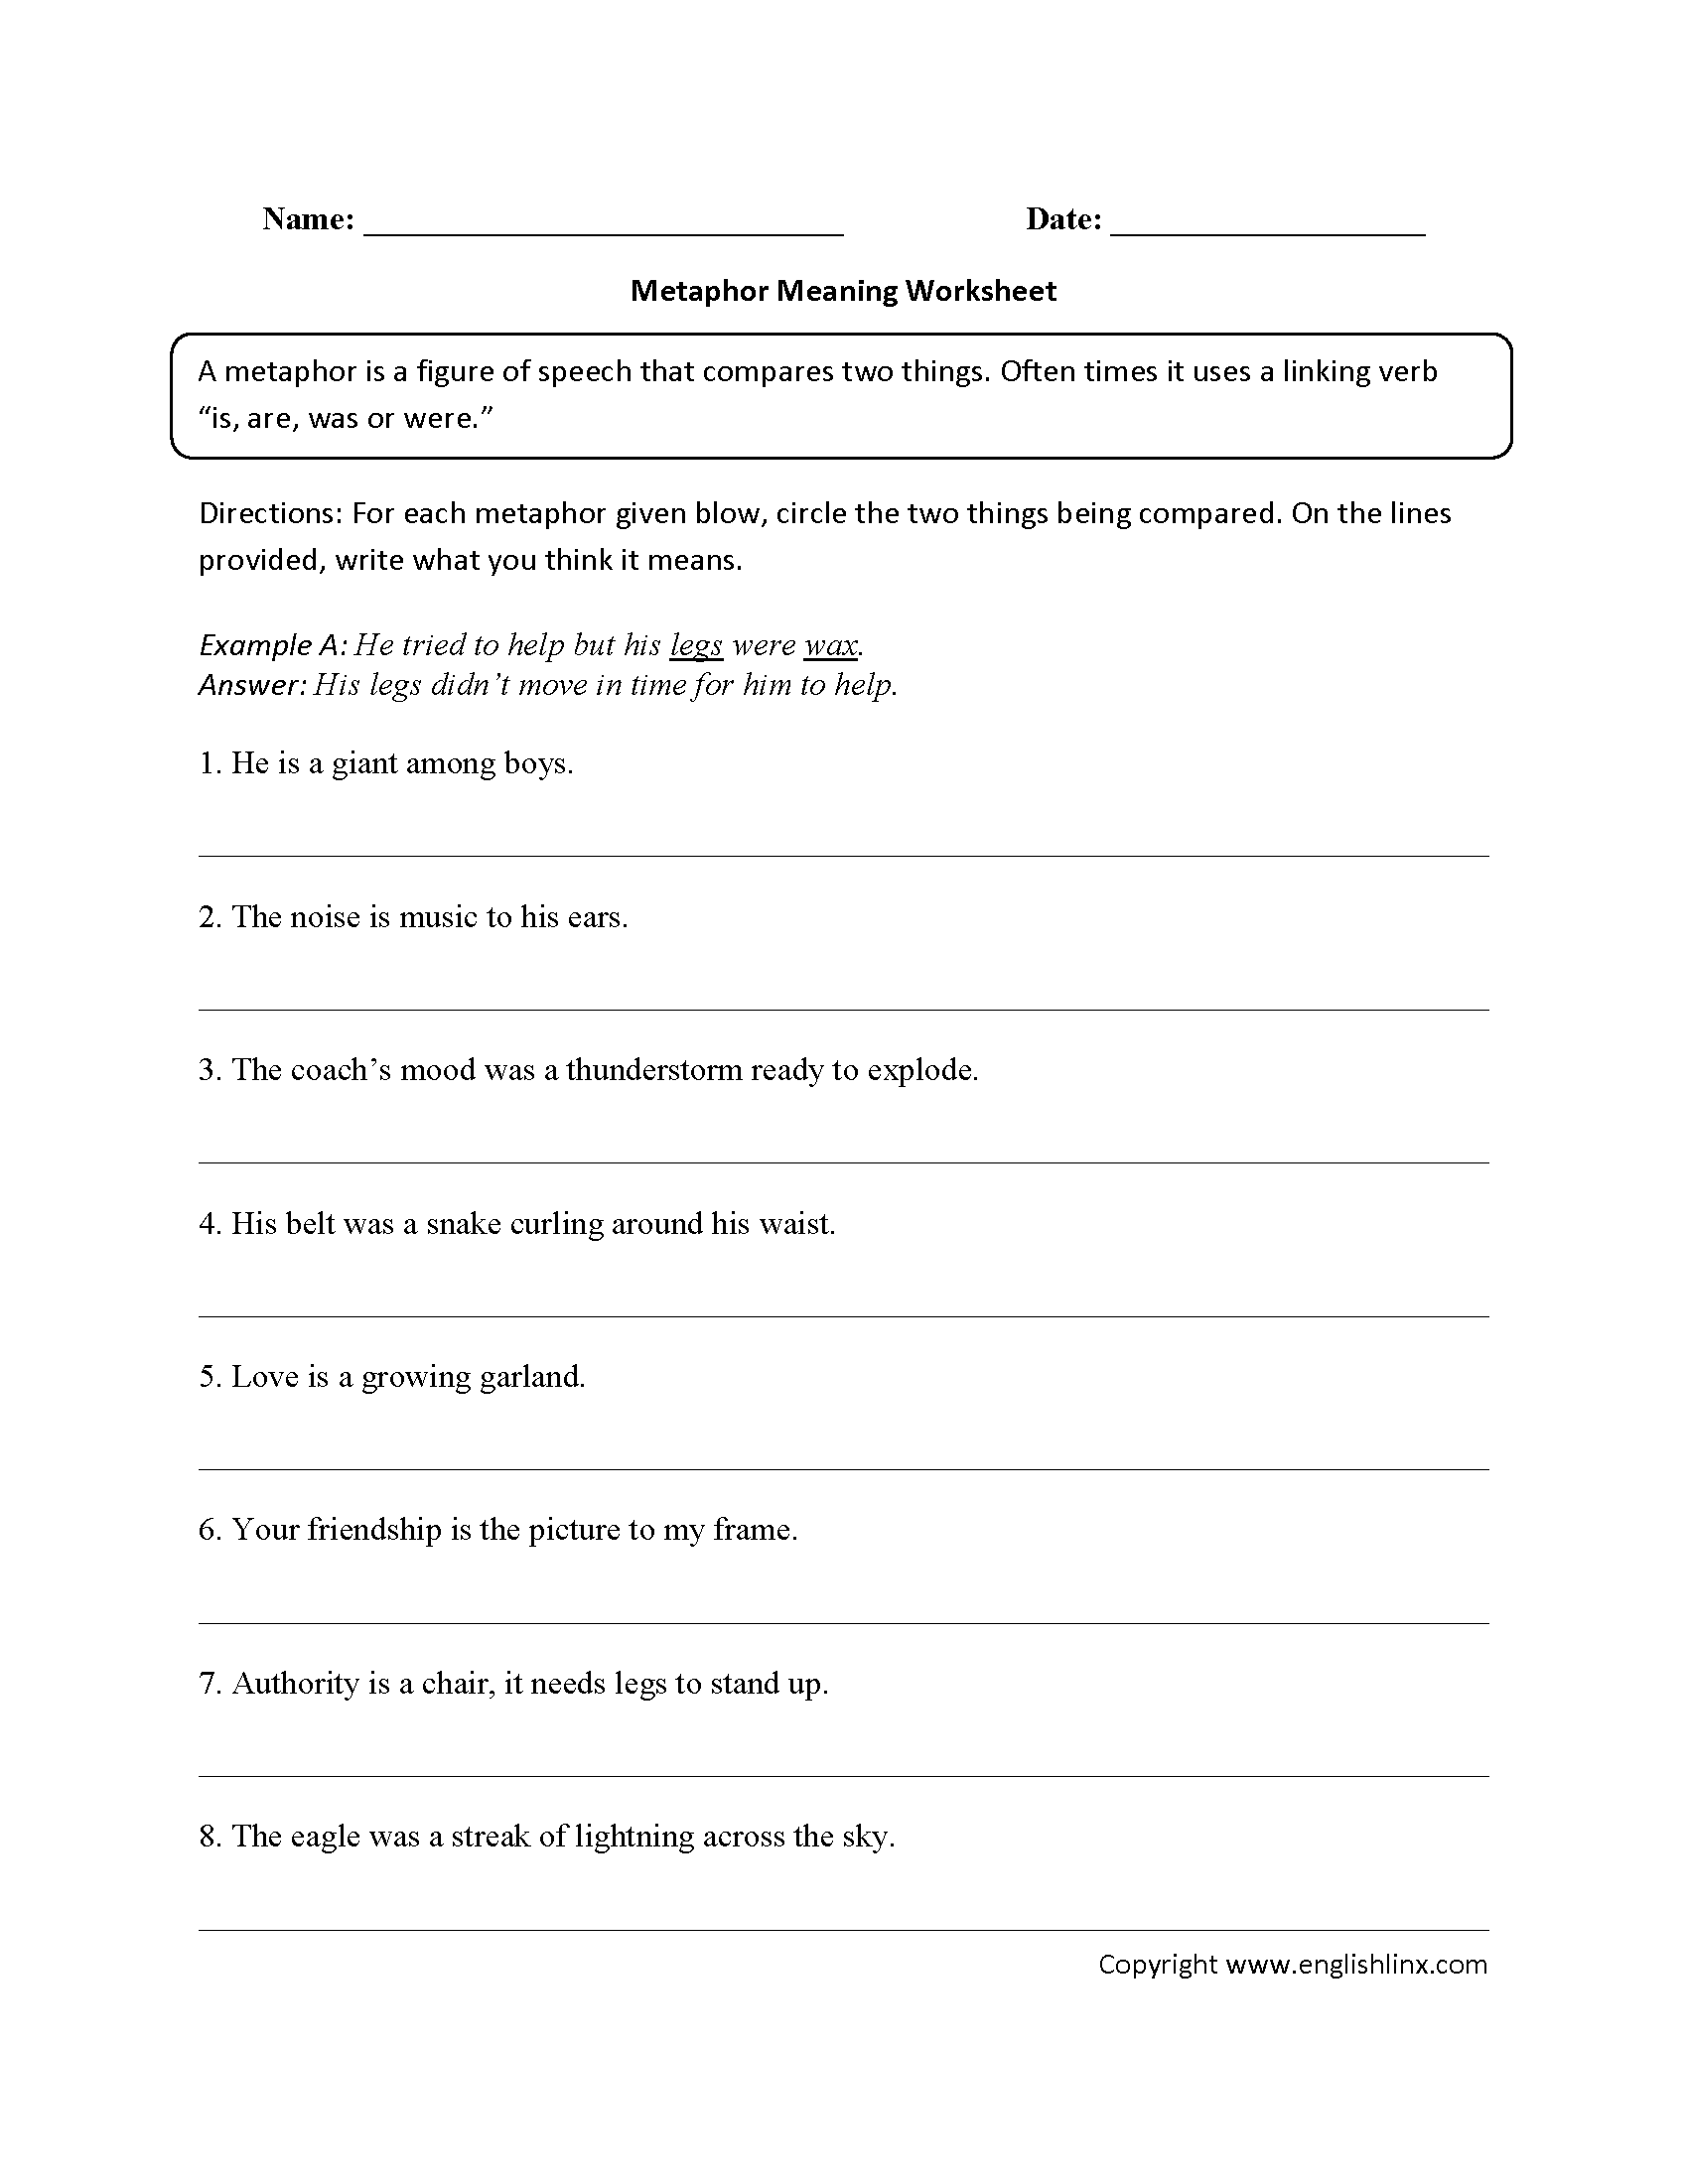 Metaphor Meaning Worksheet